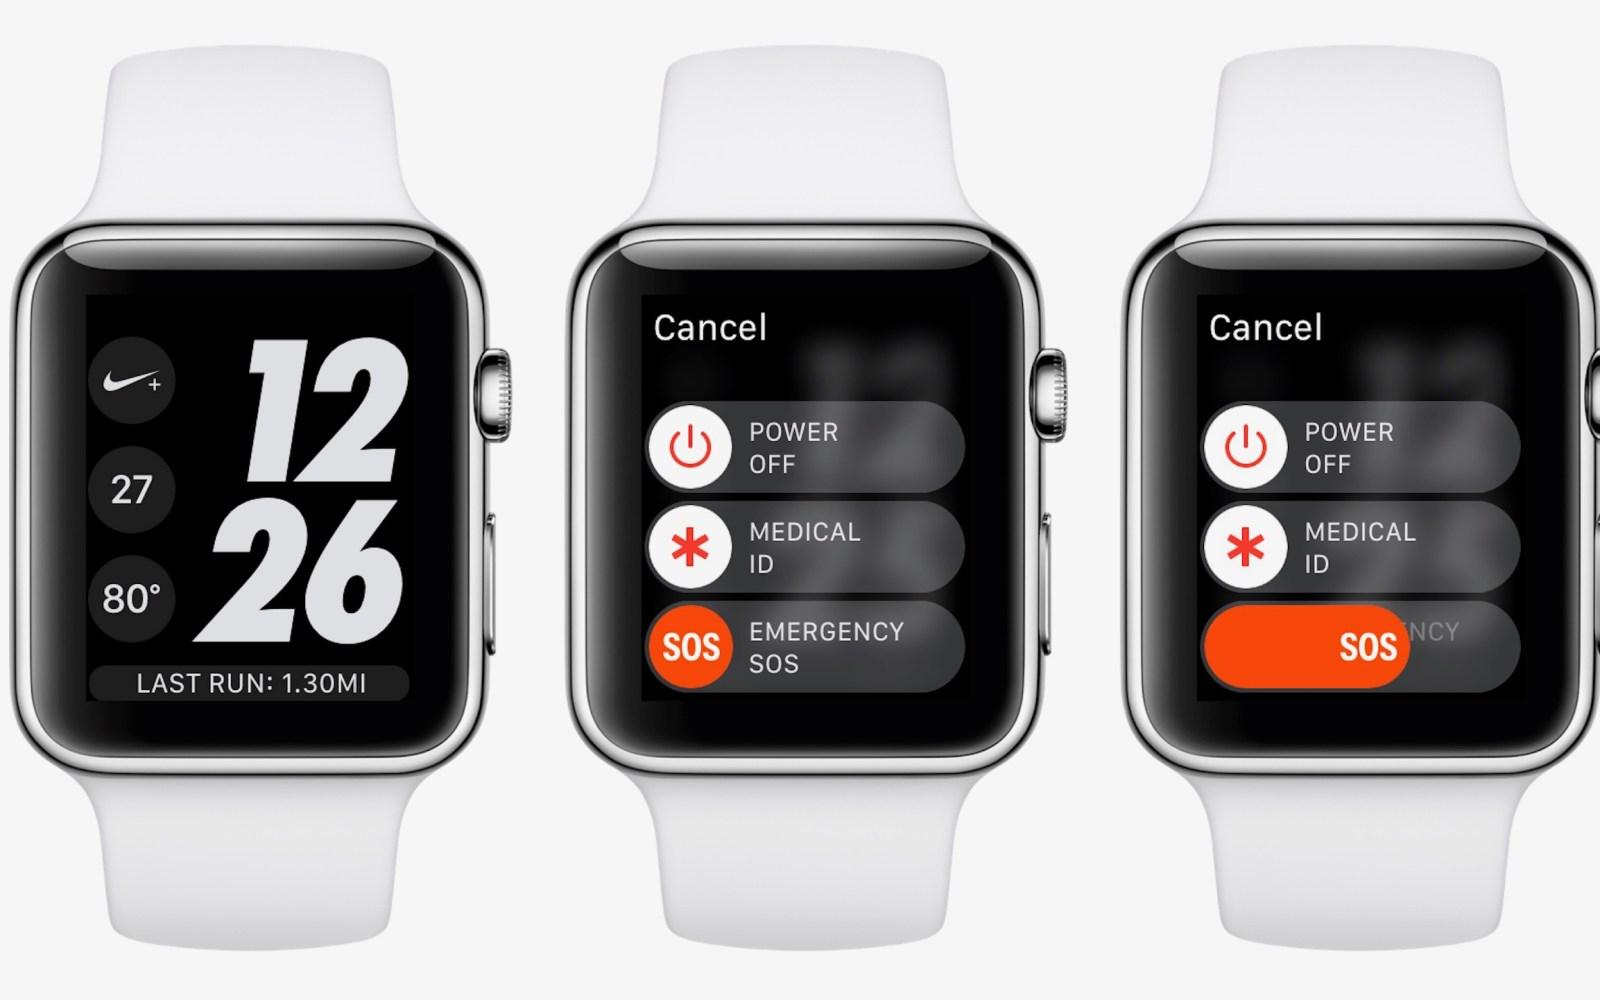 Apple Watch SOS calls 911 after college student's car crash